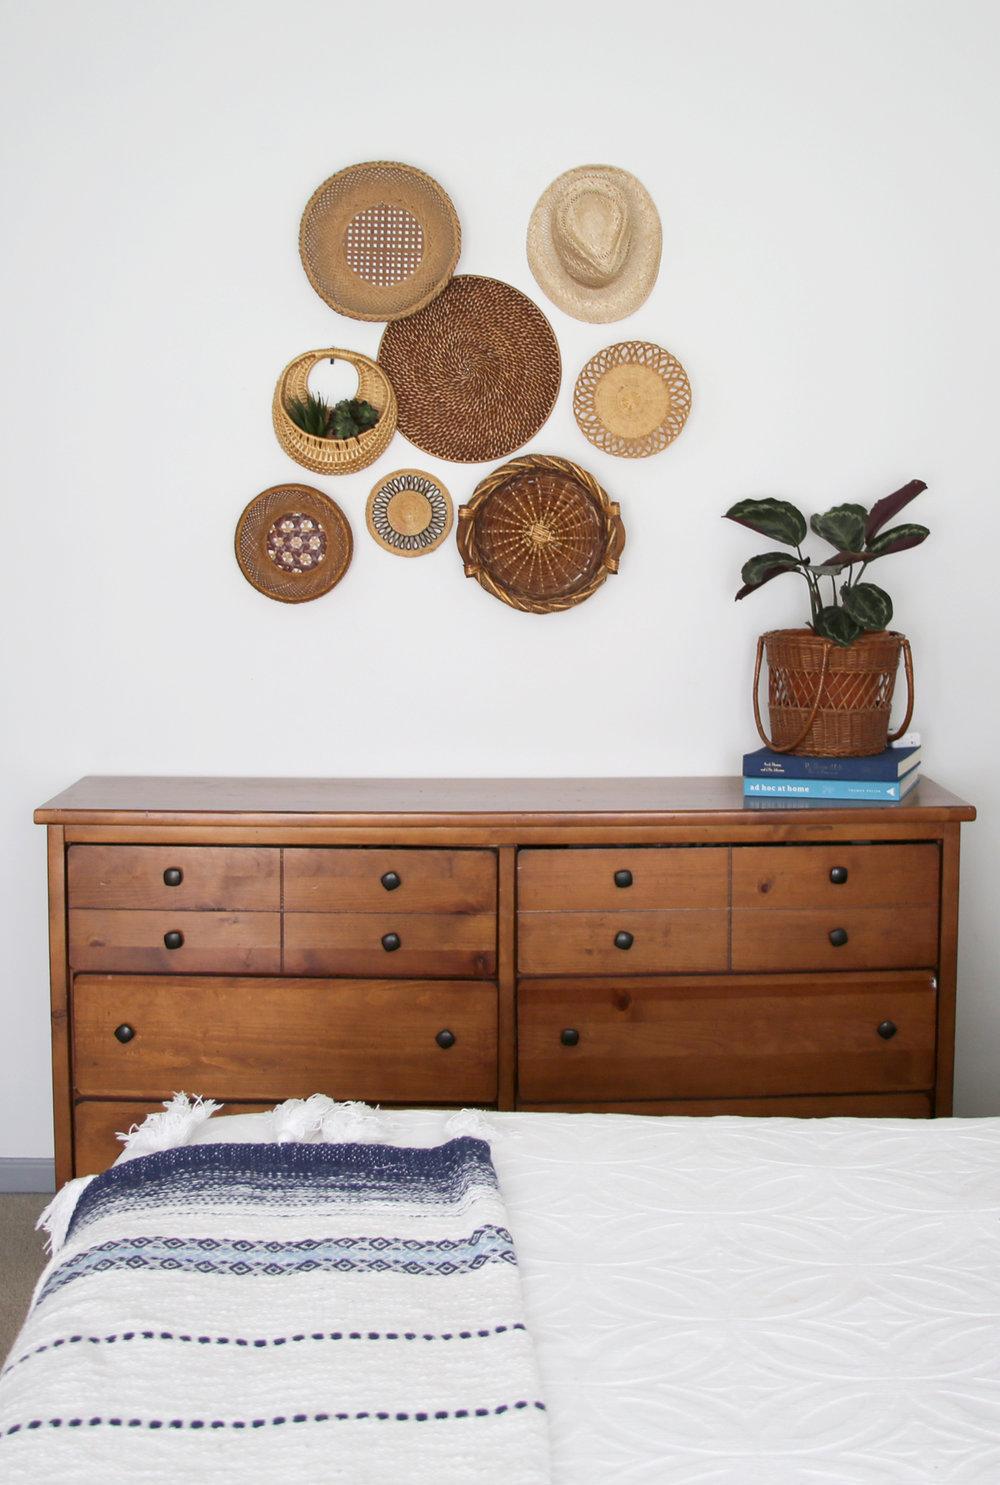 Basket Wall .jpg